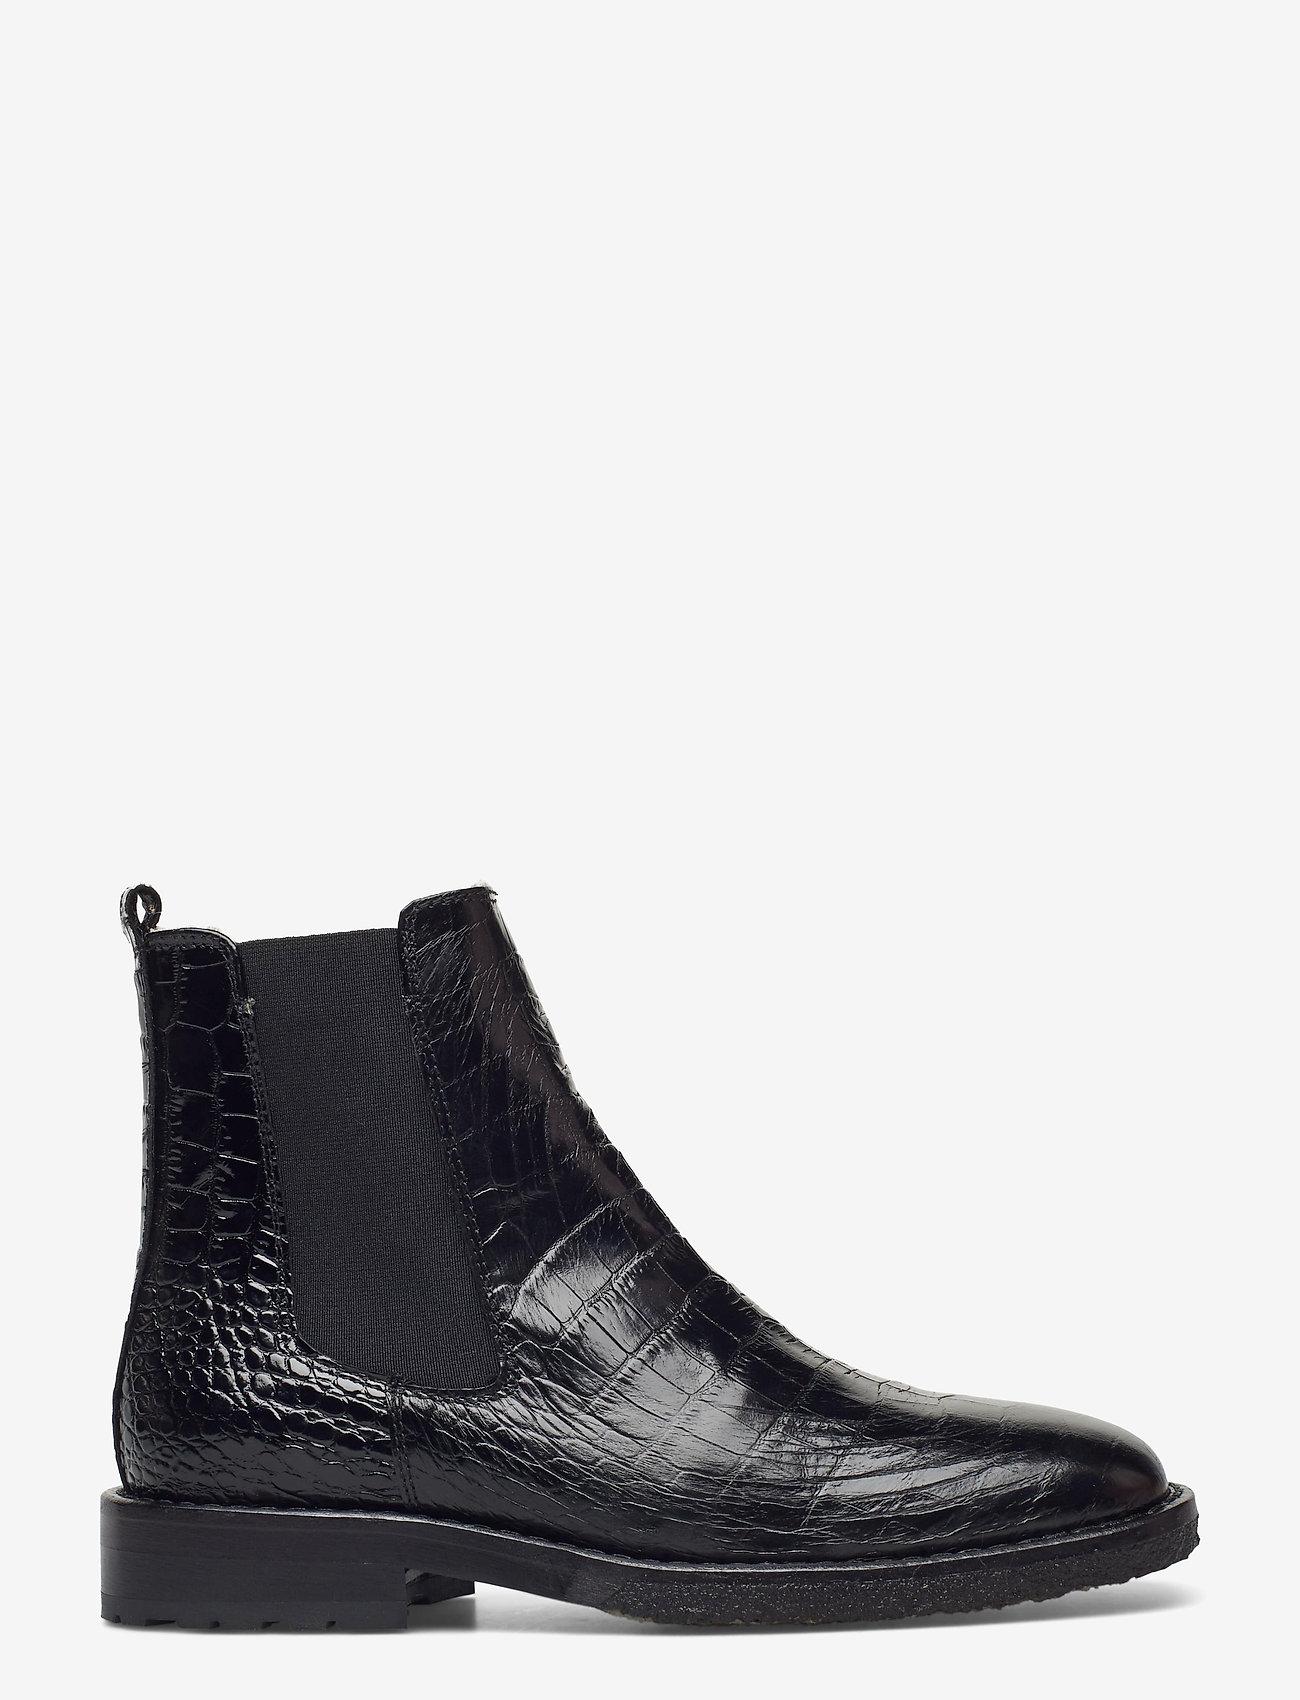 Billi Bi - Boots 4840 - chelsea boots - black luisiana croco 10 - 1